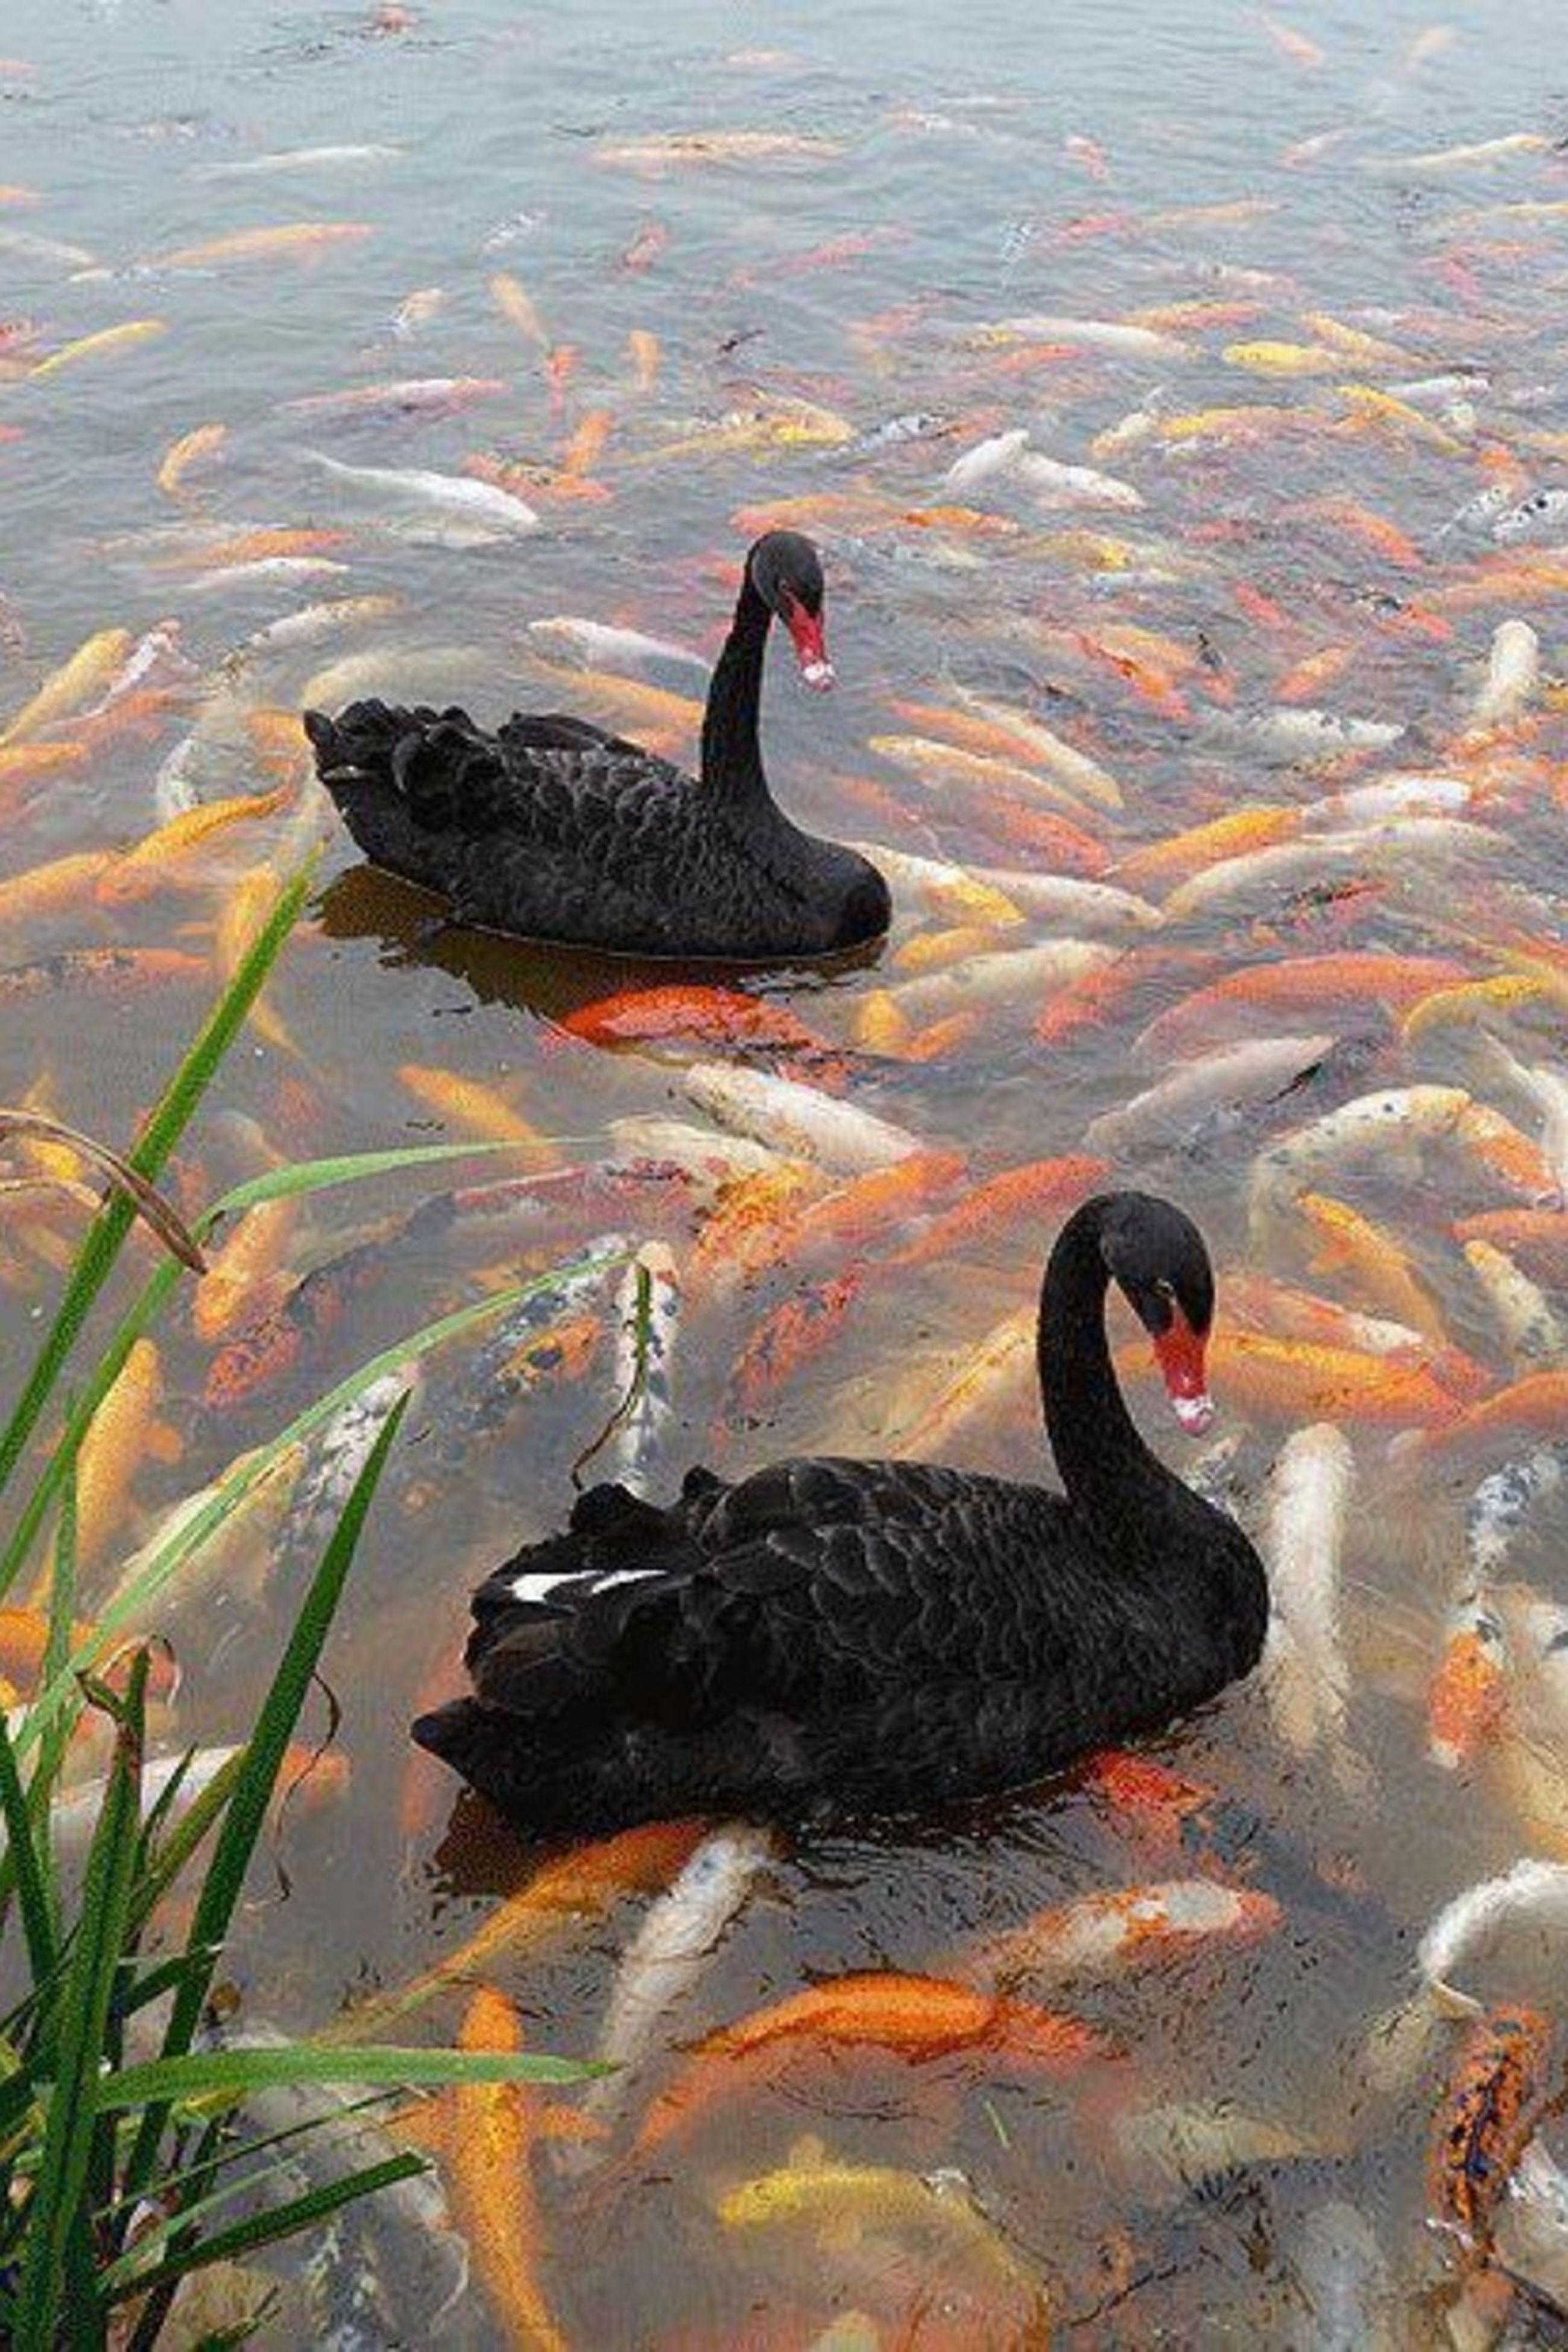 animal themes, animals in the wild, bird, wildlife, water, lake, duck, one animal, nature, mallard duck, swimming, high angle view, reflection, pond, two animals, outdoors, beak, zoology, water bird, no people